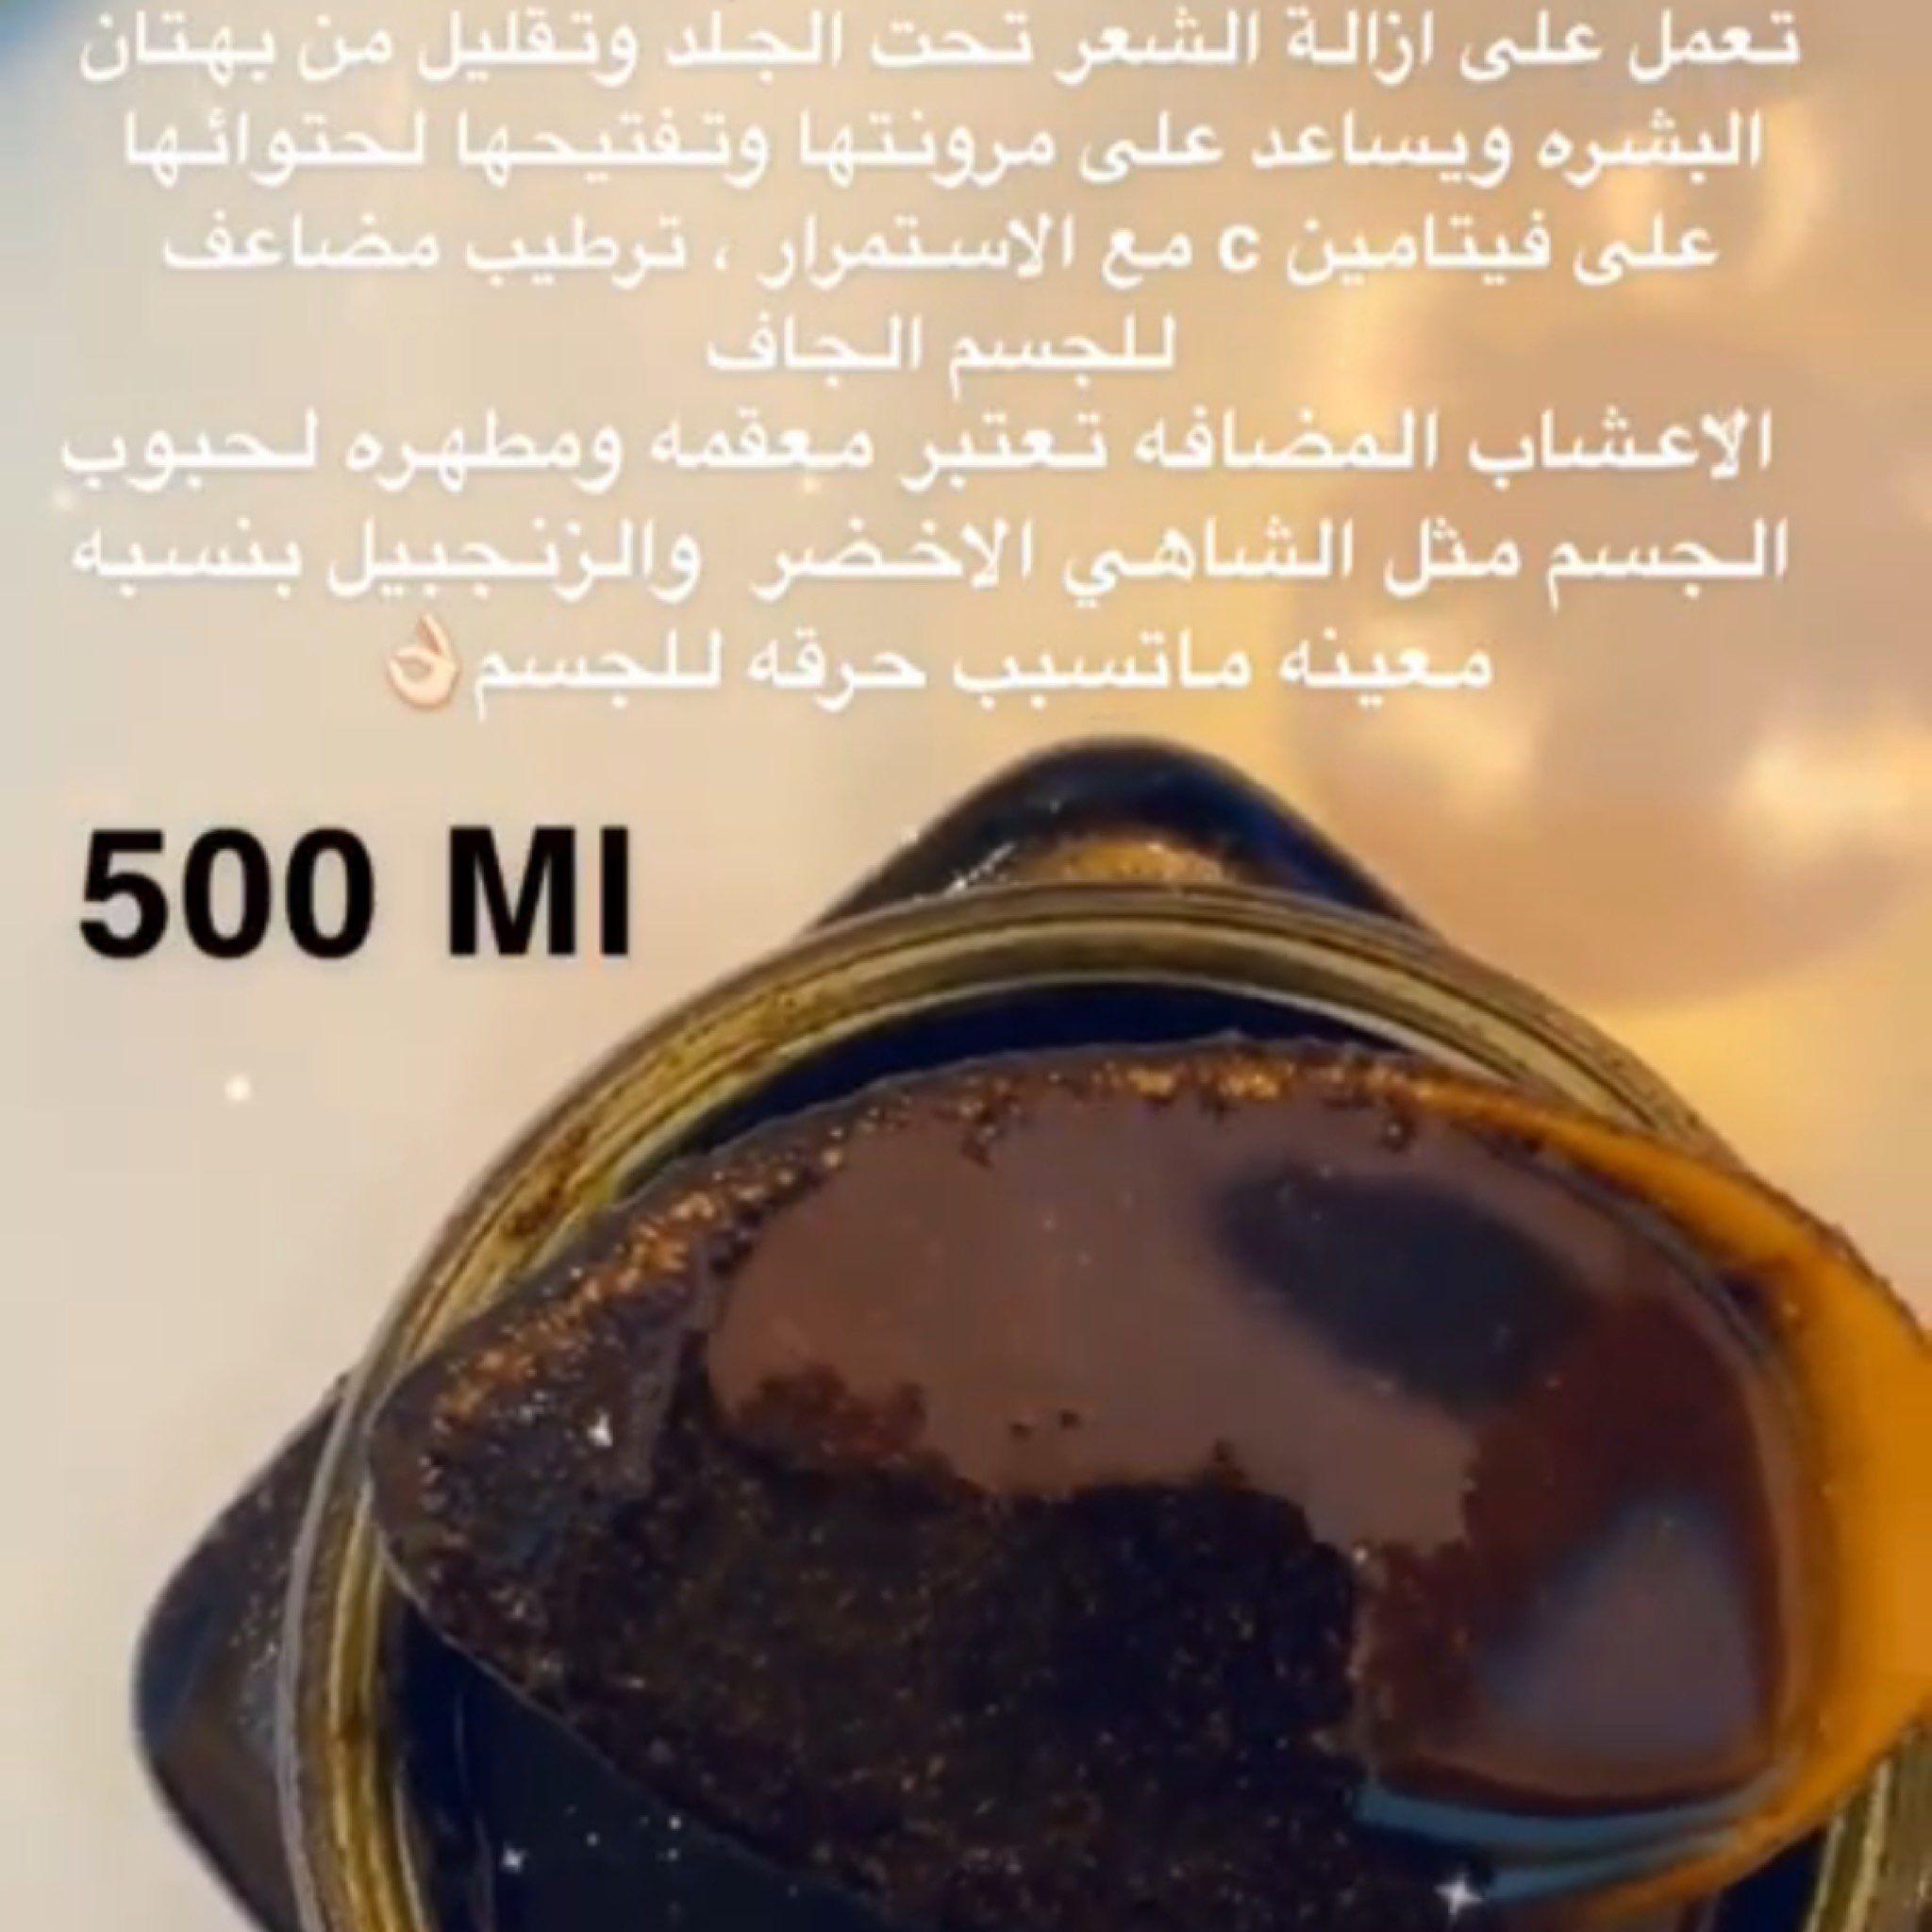 سنفرة الاعشاب للجسم Beauty Products Square Sunglass Rayban Wayfarer Arabic Quotes